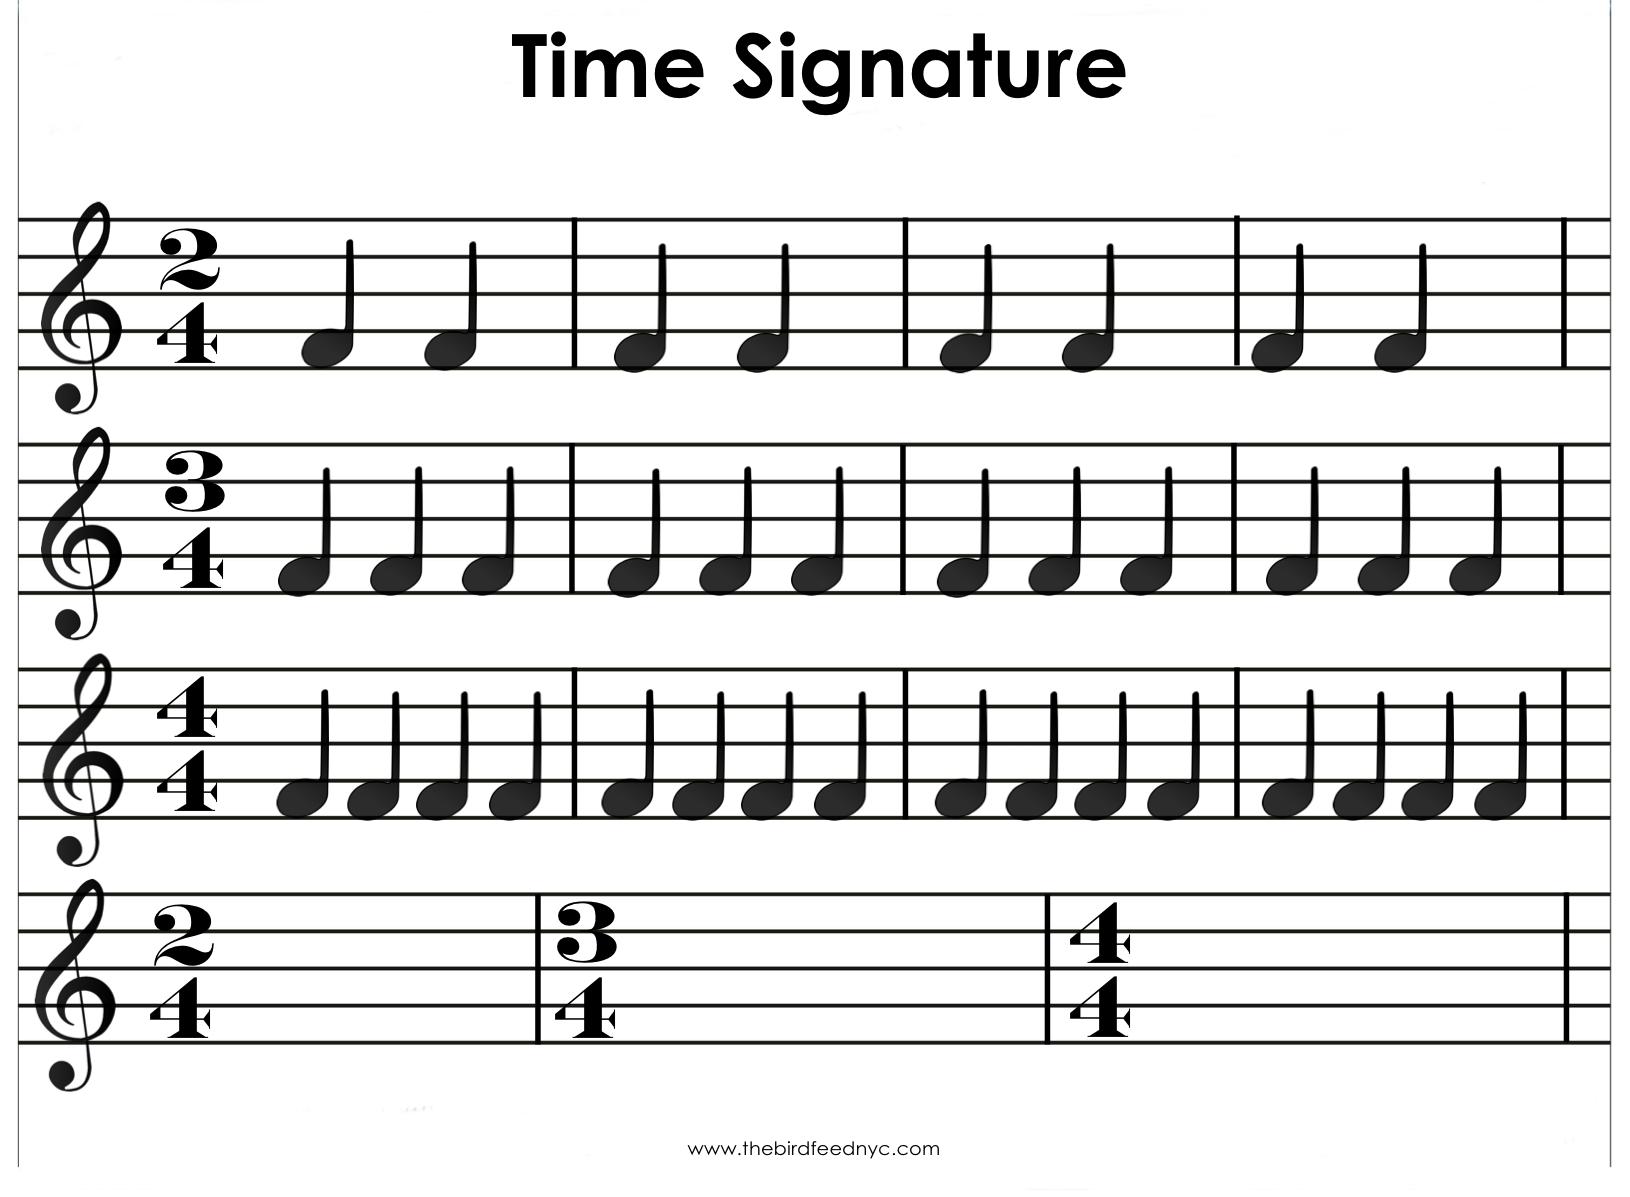 worksheet Time Signature Worksheet time signature activity sheet music pinterest activities and music